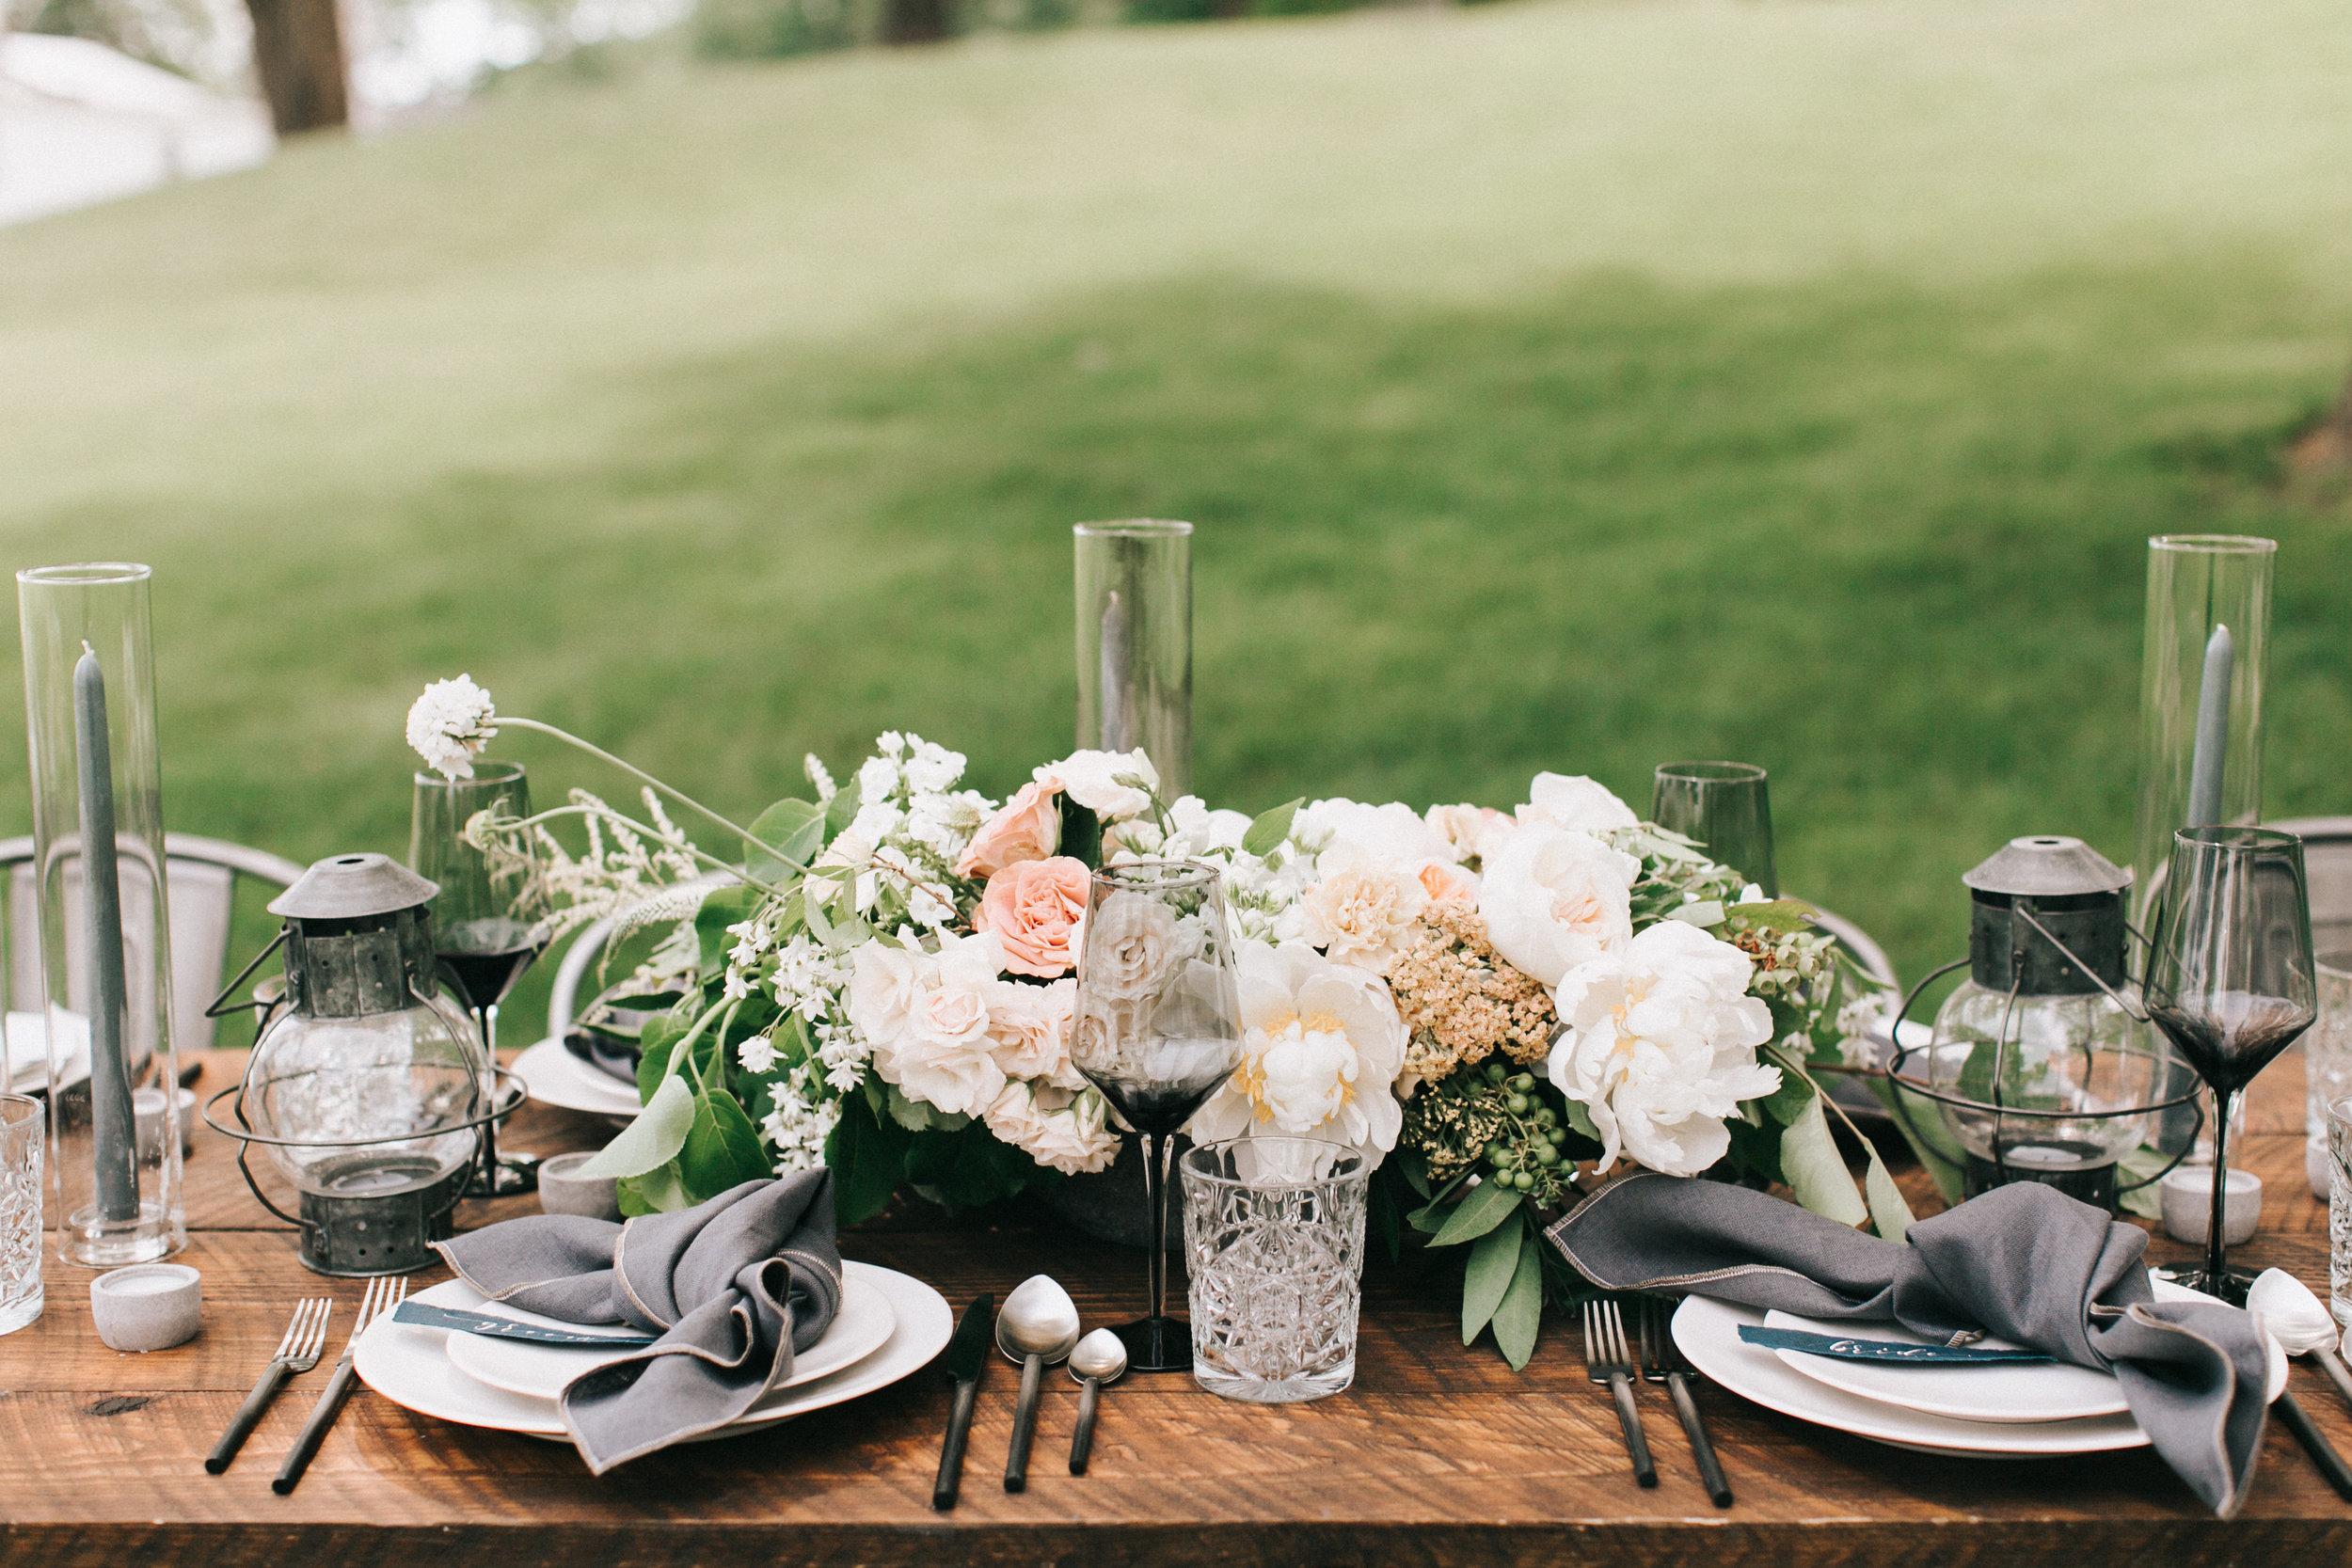 Watershed-Floral-Maine-Maritime-Wedding-Bridal-Bouquet-Centerpieces-0022.jpg